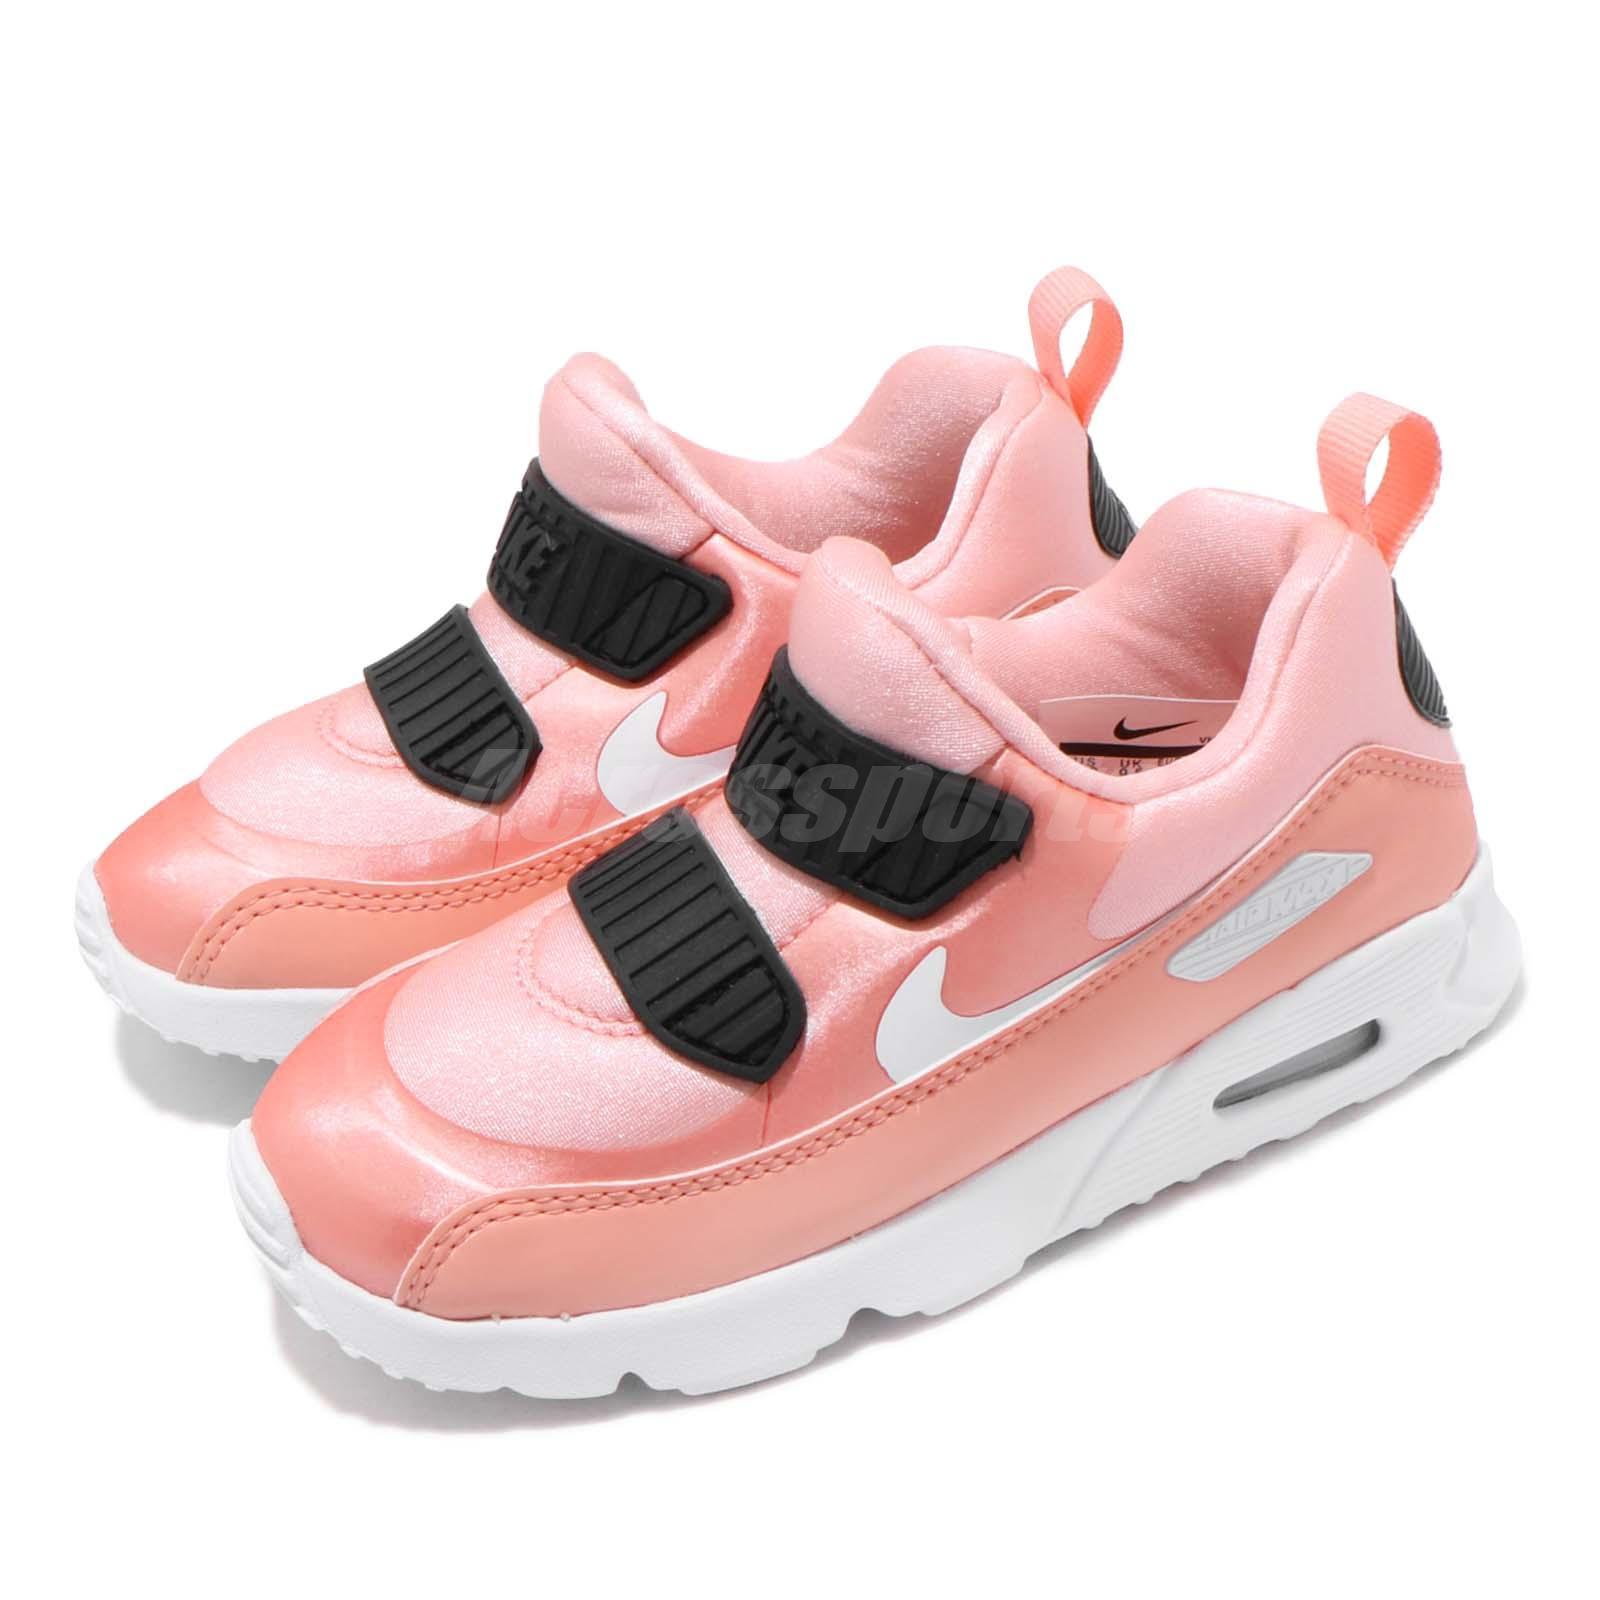 Nike Air Max Tiny 90 VDAY TD Valentines